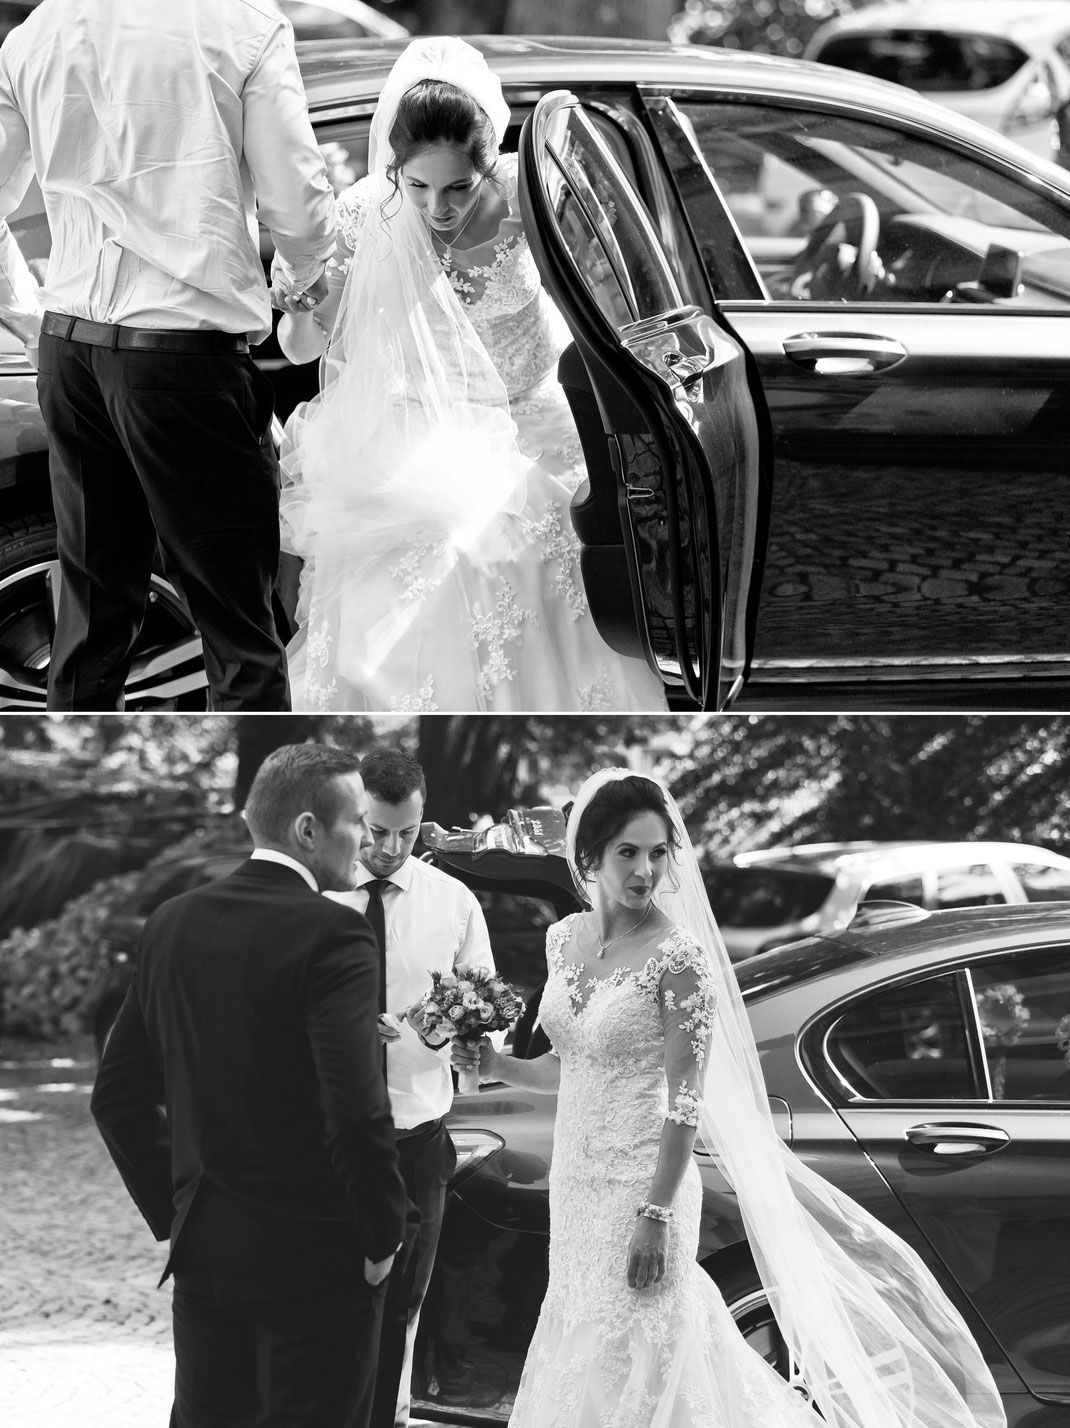 braut, bride, villa. Gückelsberg, ville gückelsberg Hochzeitsfeier, villa gückelsberg heeiraten, hochzeitsreportage, fotograf, hochzeit,